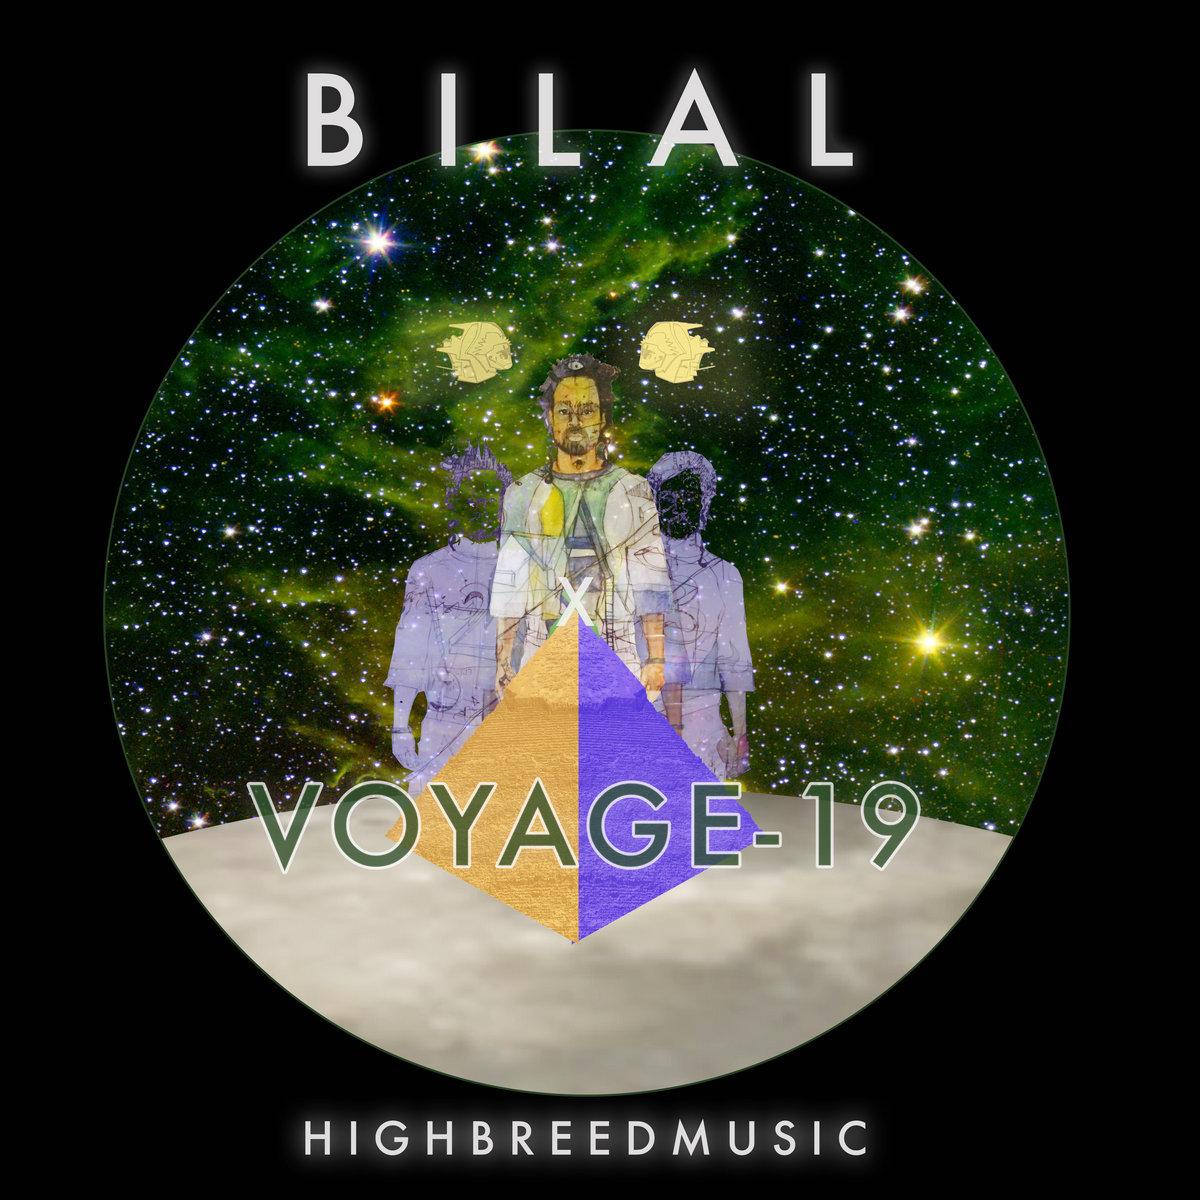 bilal voyage 19 album cover artwork Bilal Releases New Star Studded Album VOYAGE 19: Stream